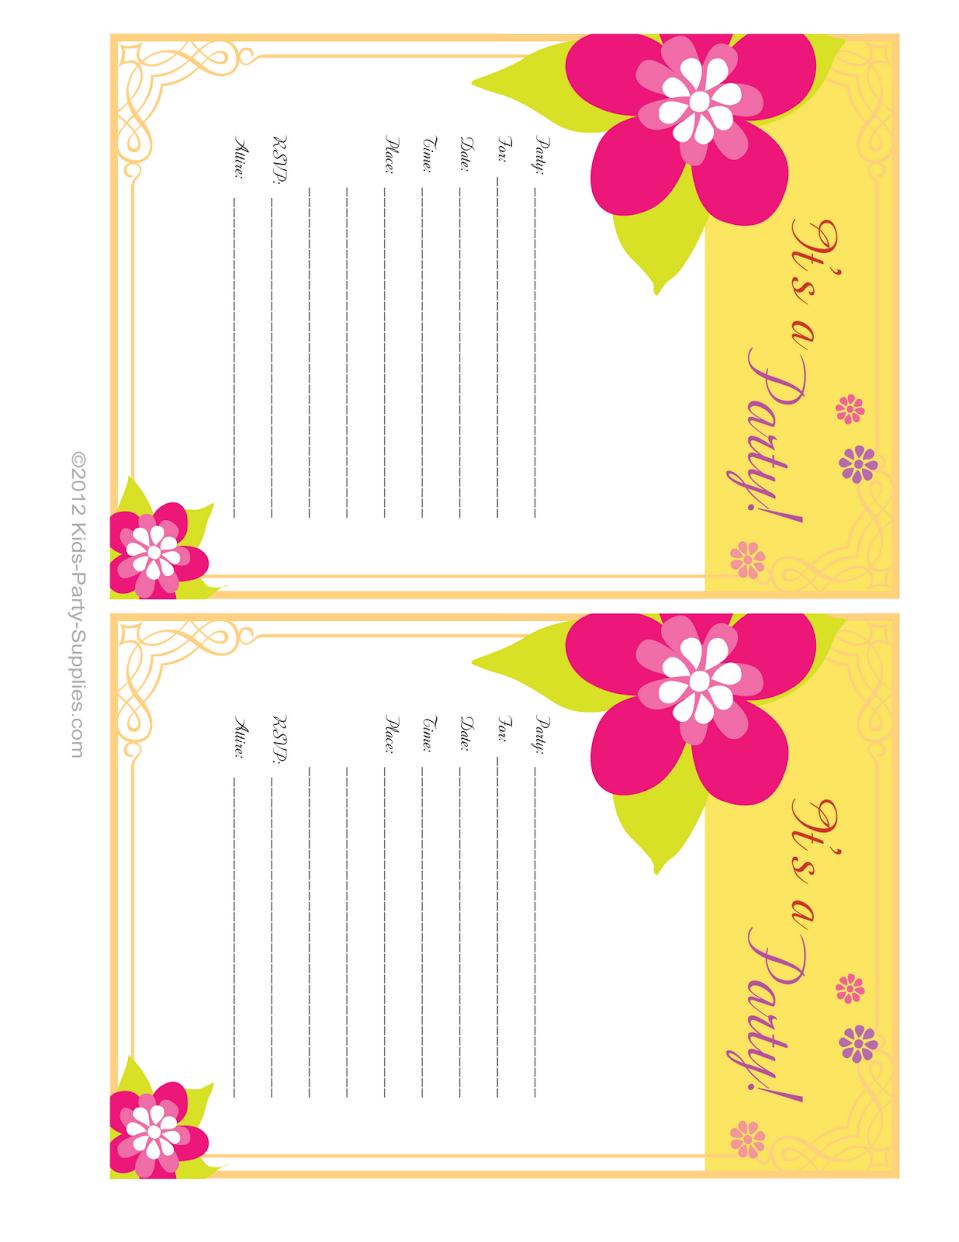 Hawaiian Party Invitations Free Printable   Party Invitations   Free - Hawaiian Party Invitations Free Printable